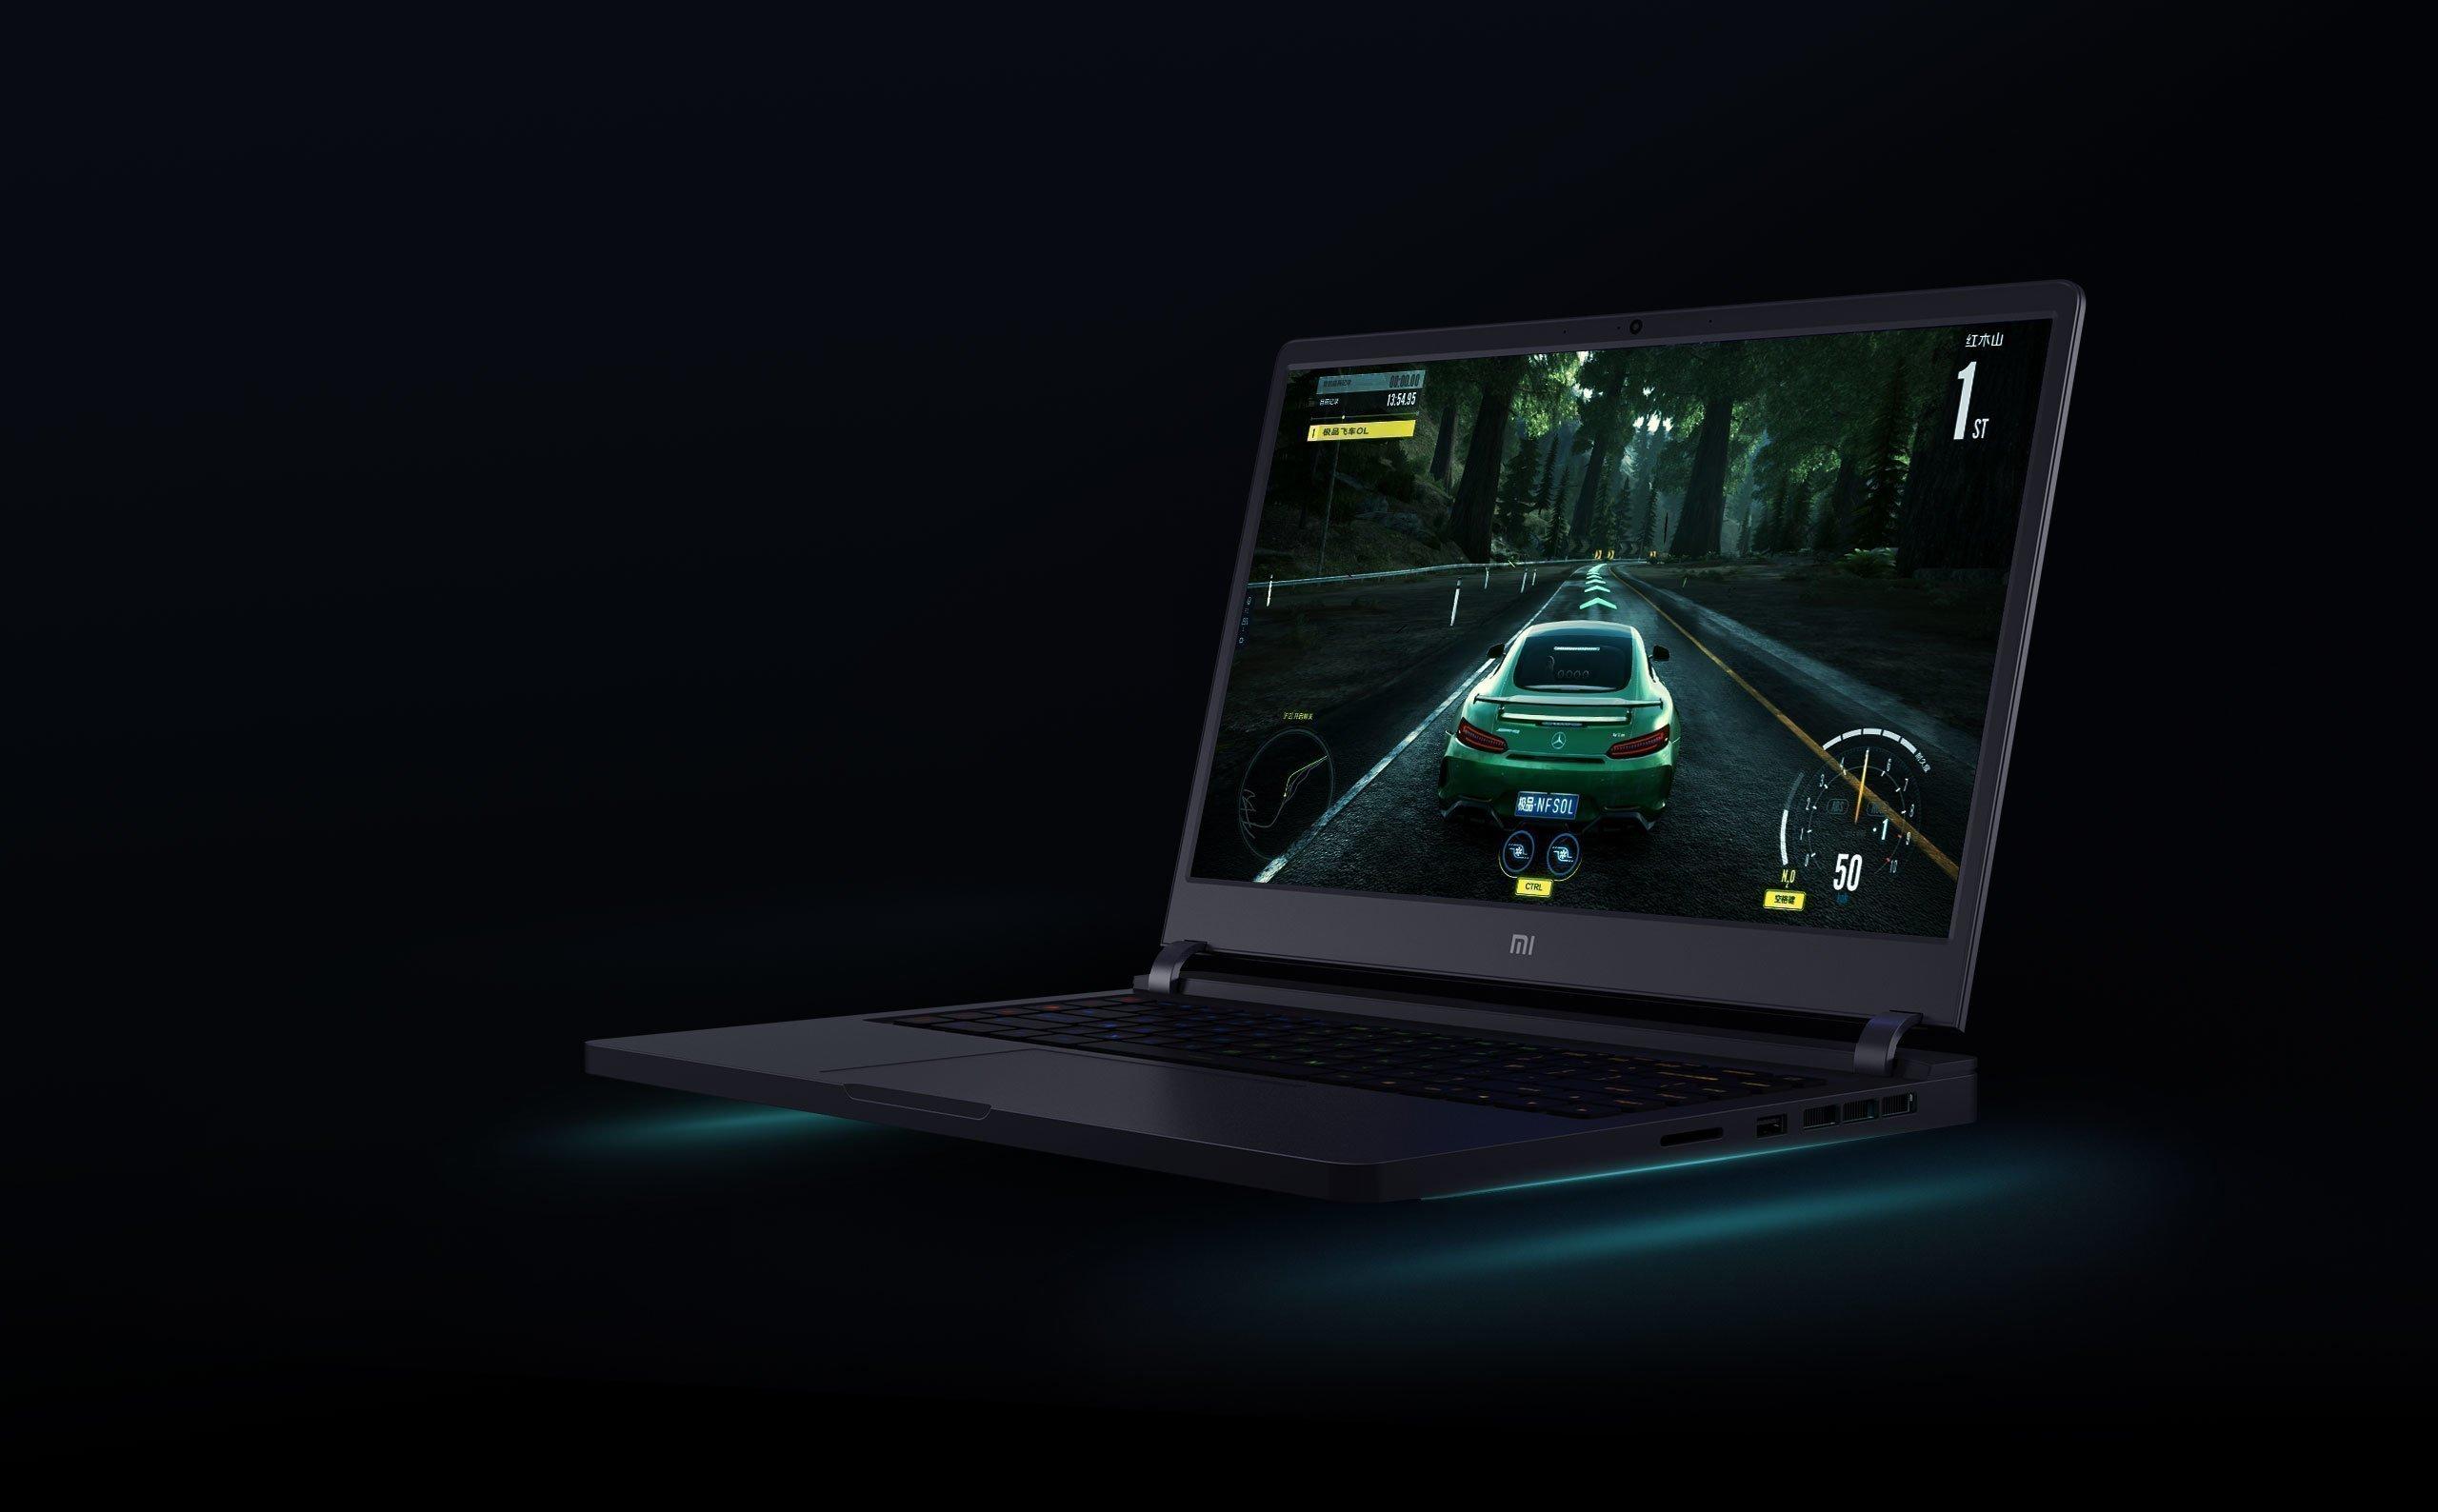 Xiaomi Gaming Laptop Wallpaper: Xiaomi Mi Gaming Laptop 2 15.6 I7 256GB+1TB/8GB/GTX 1050